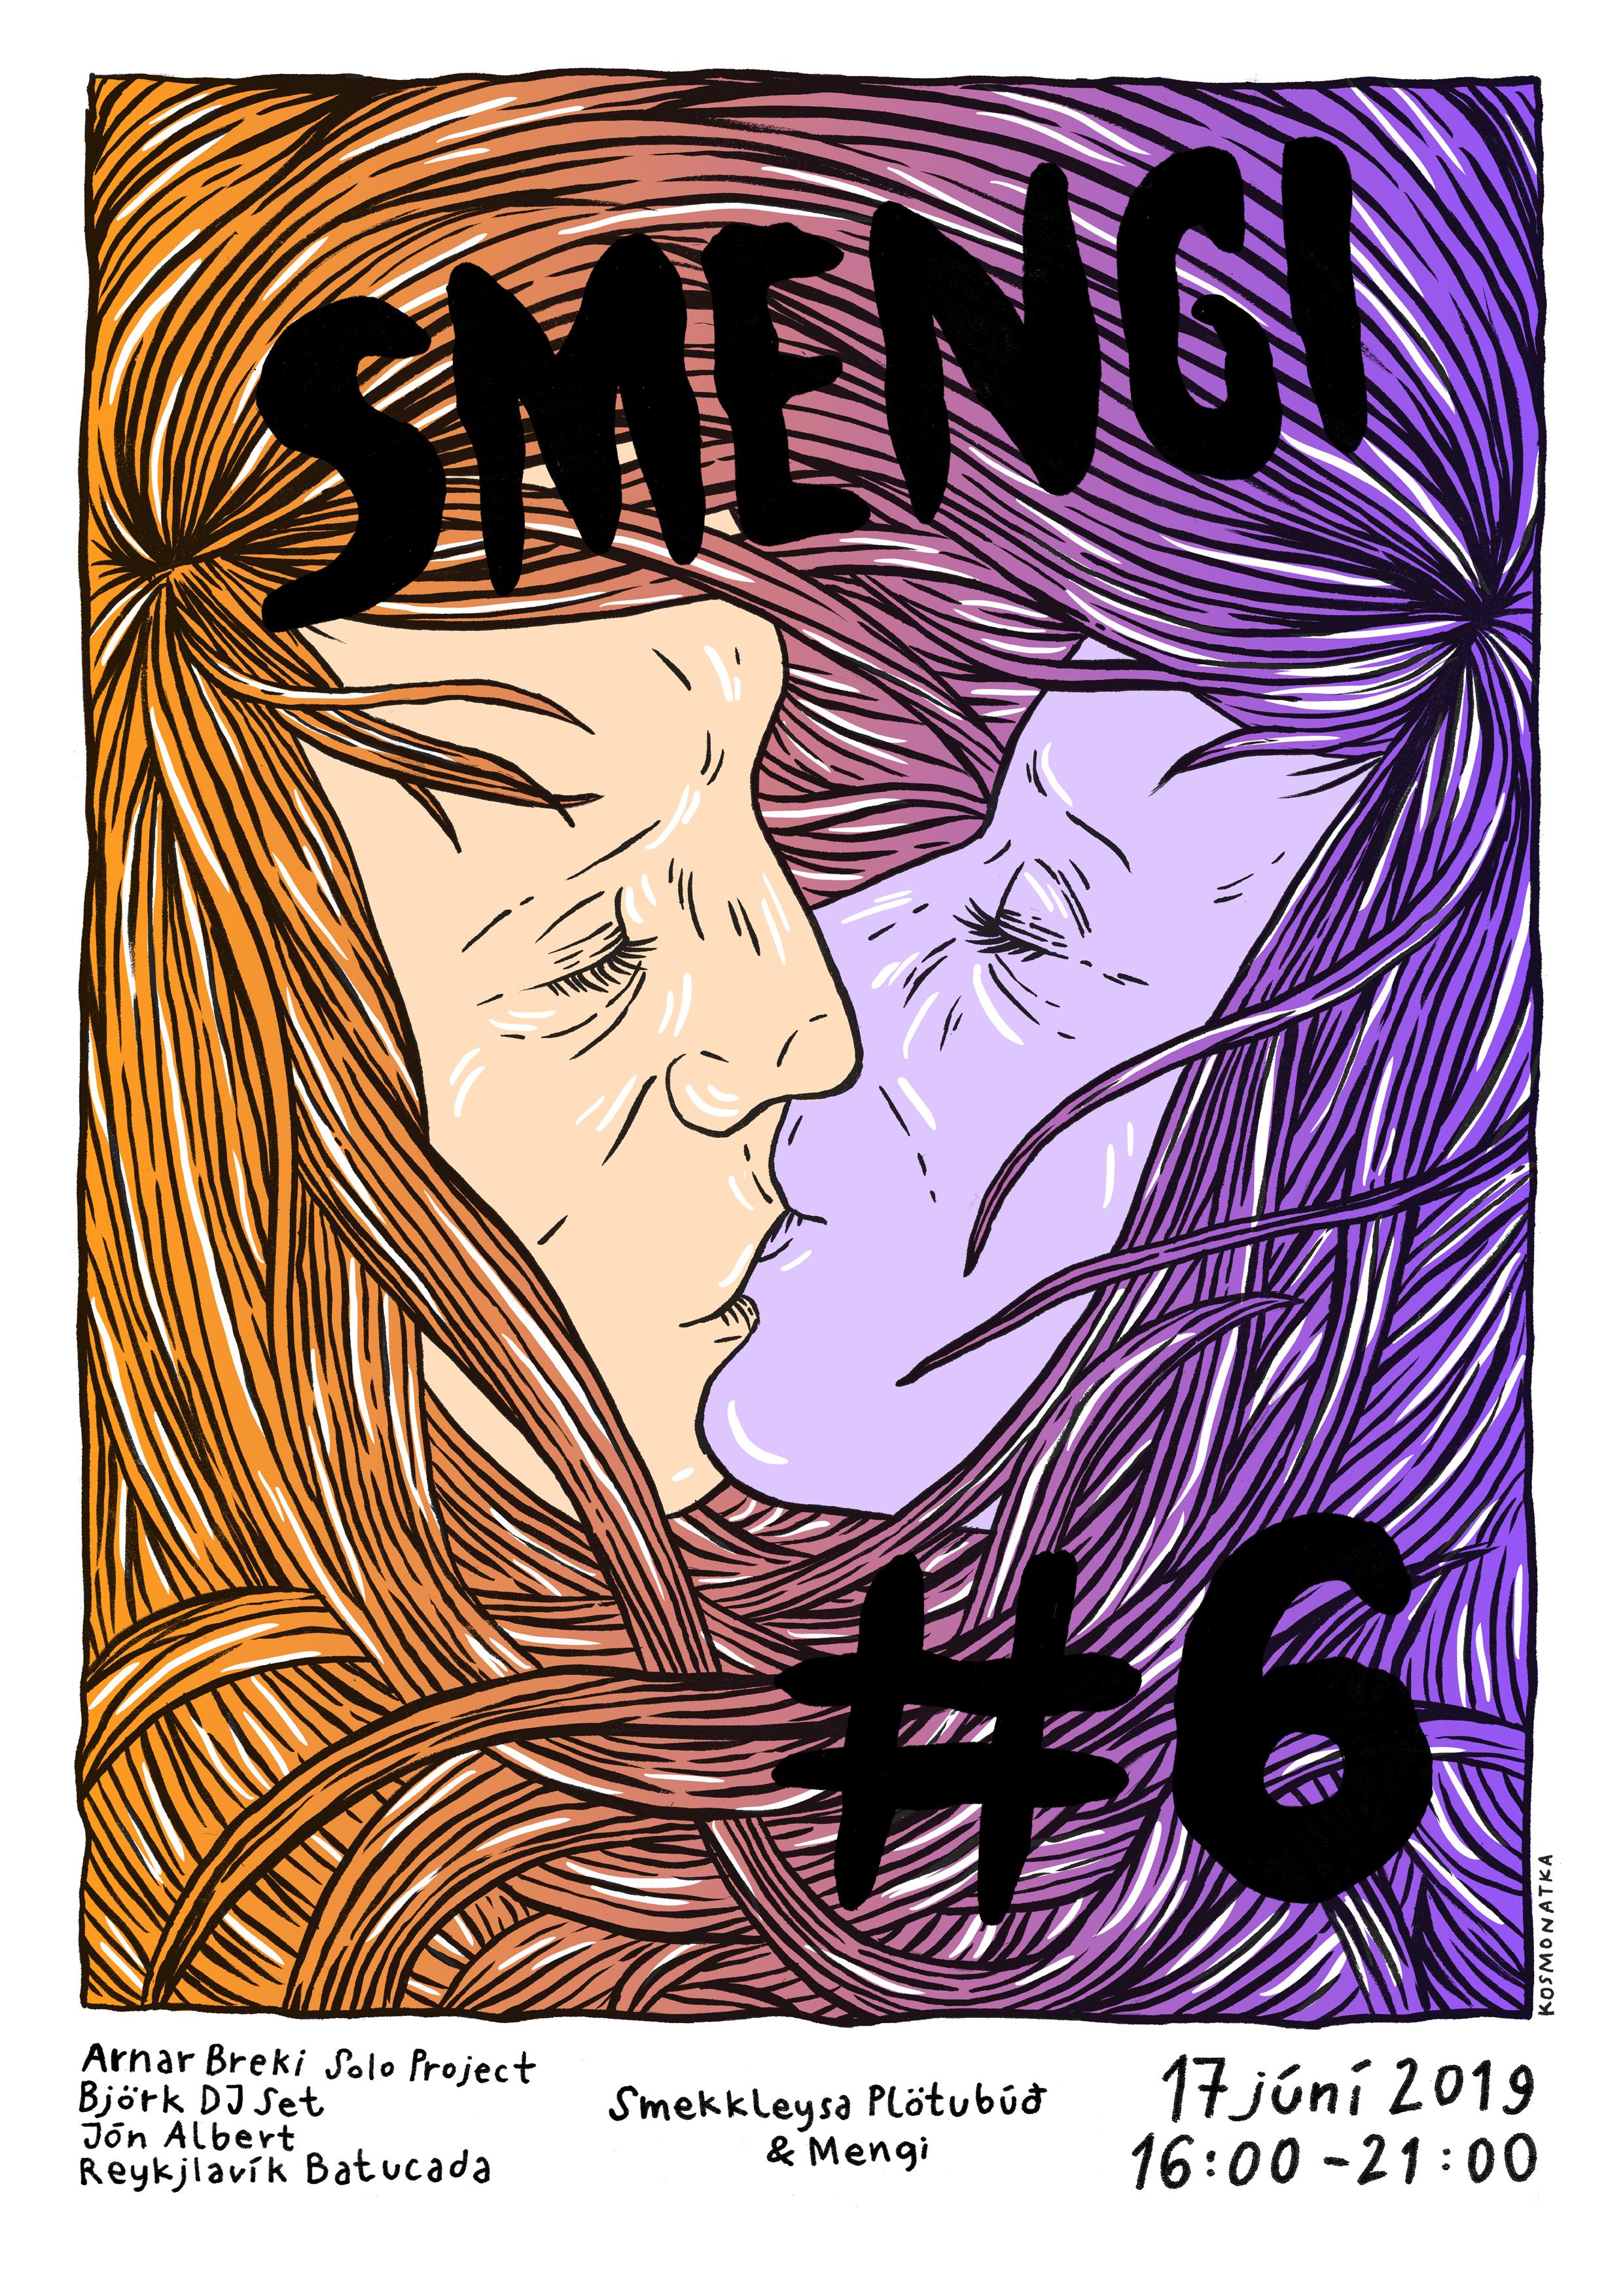 smengi6_poster_a4.jpg